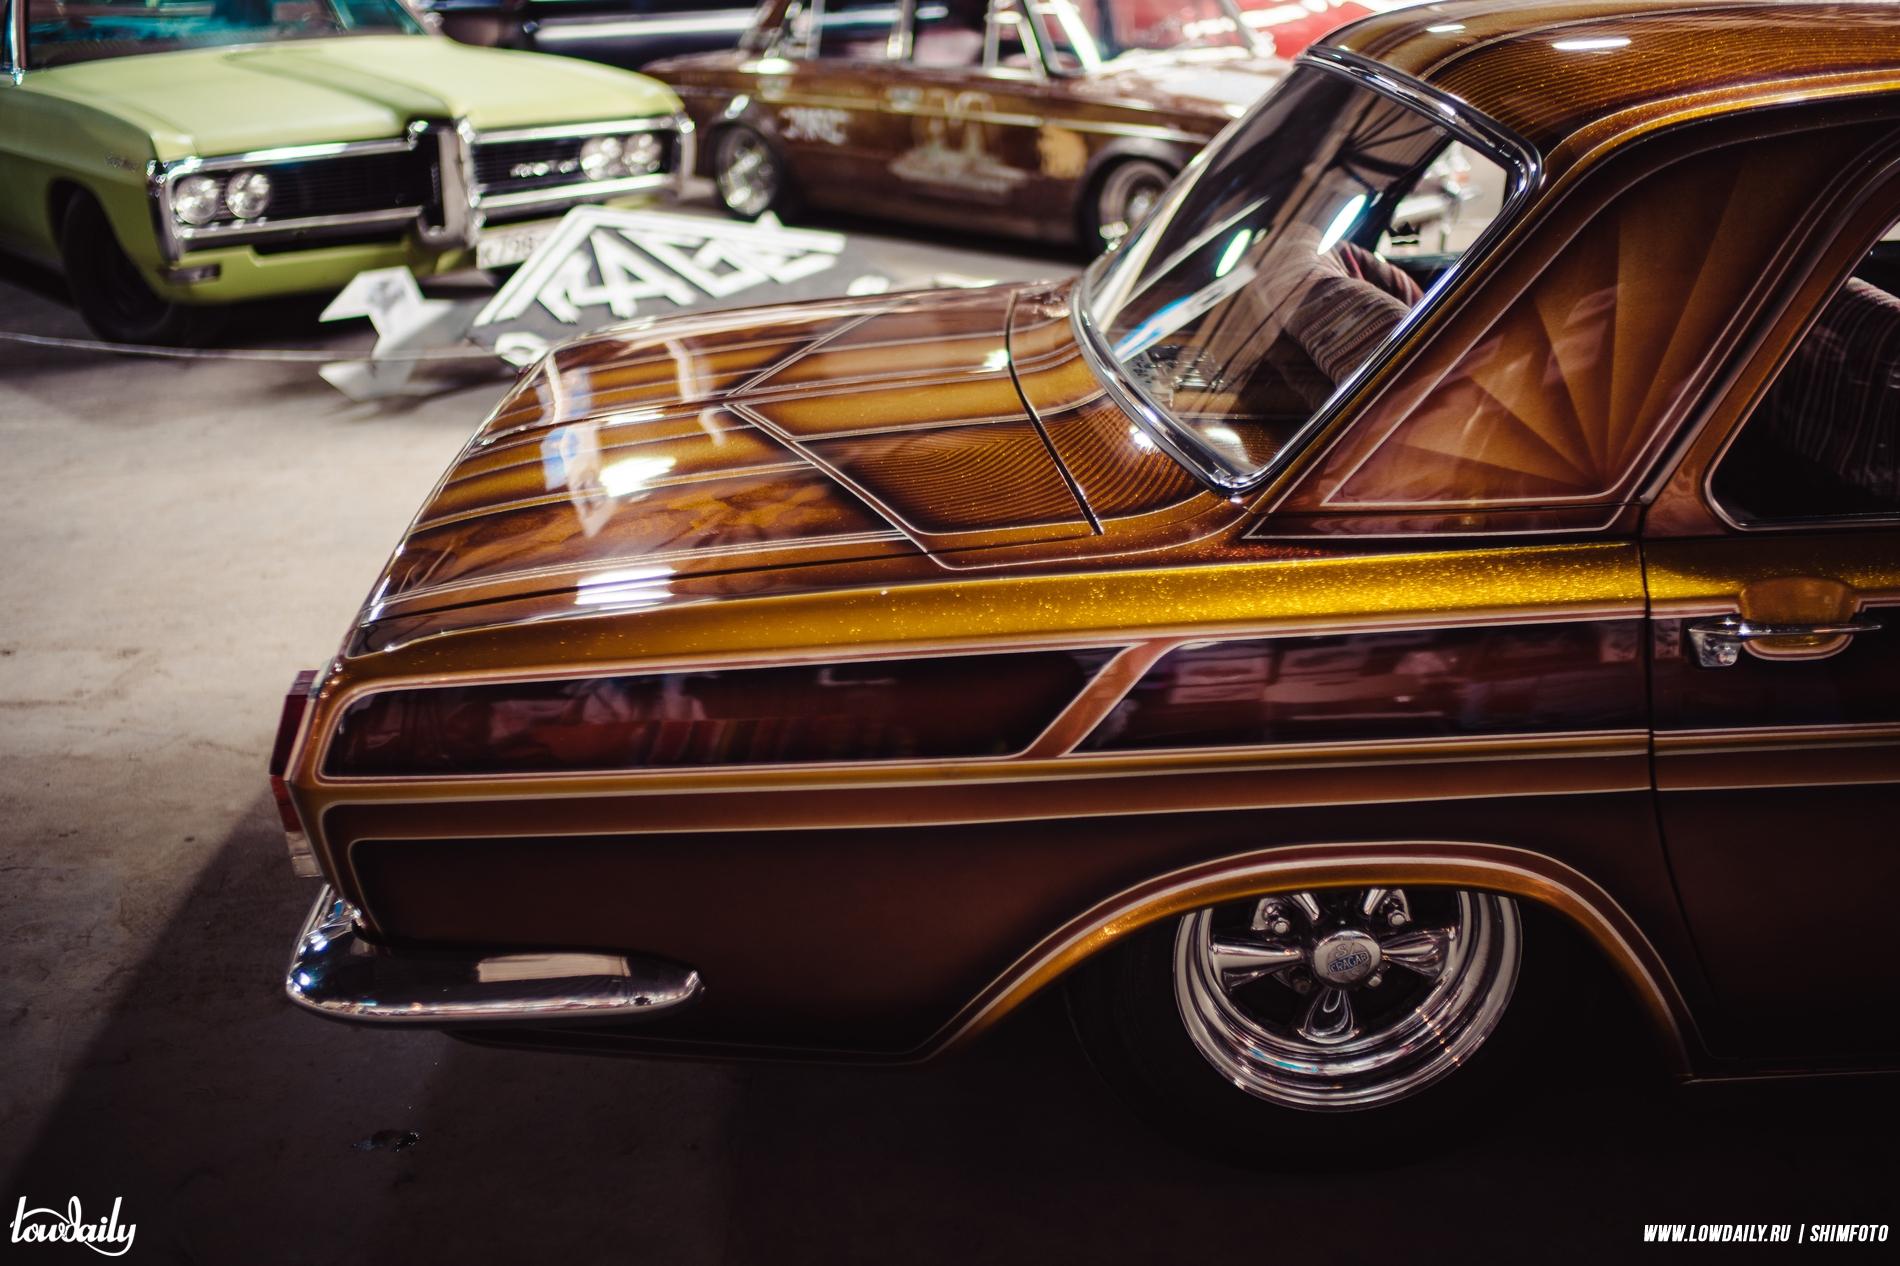 Volga РОЗА - Royal Garage